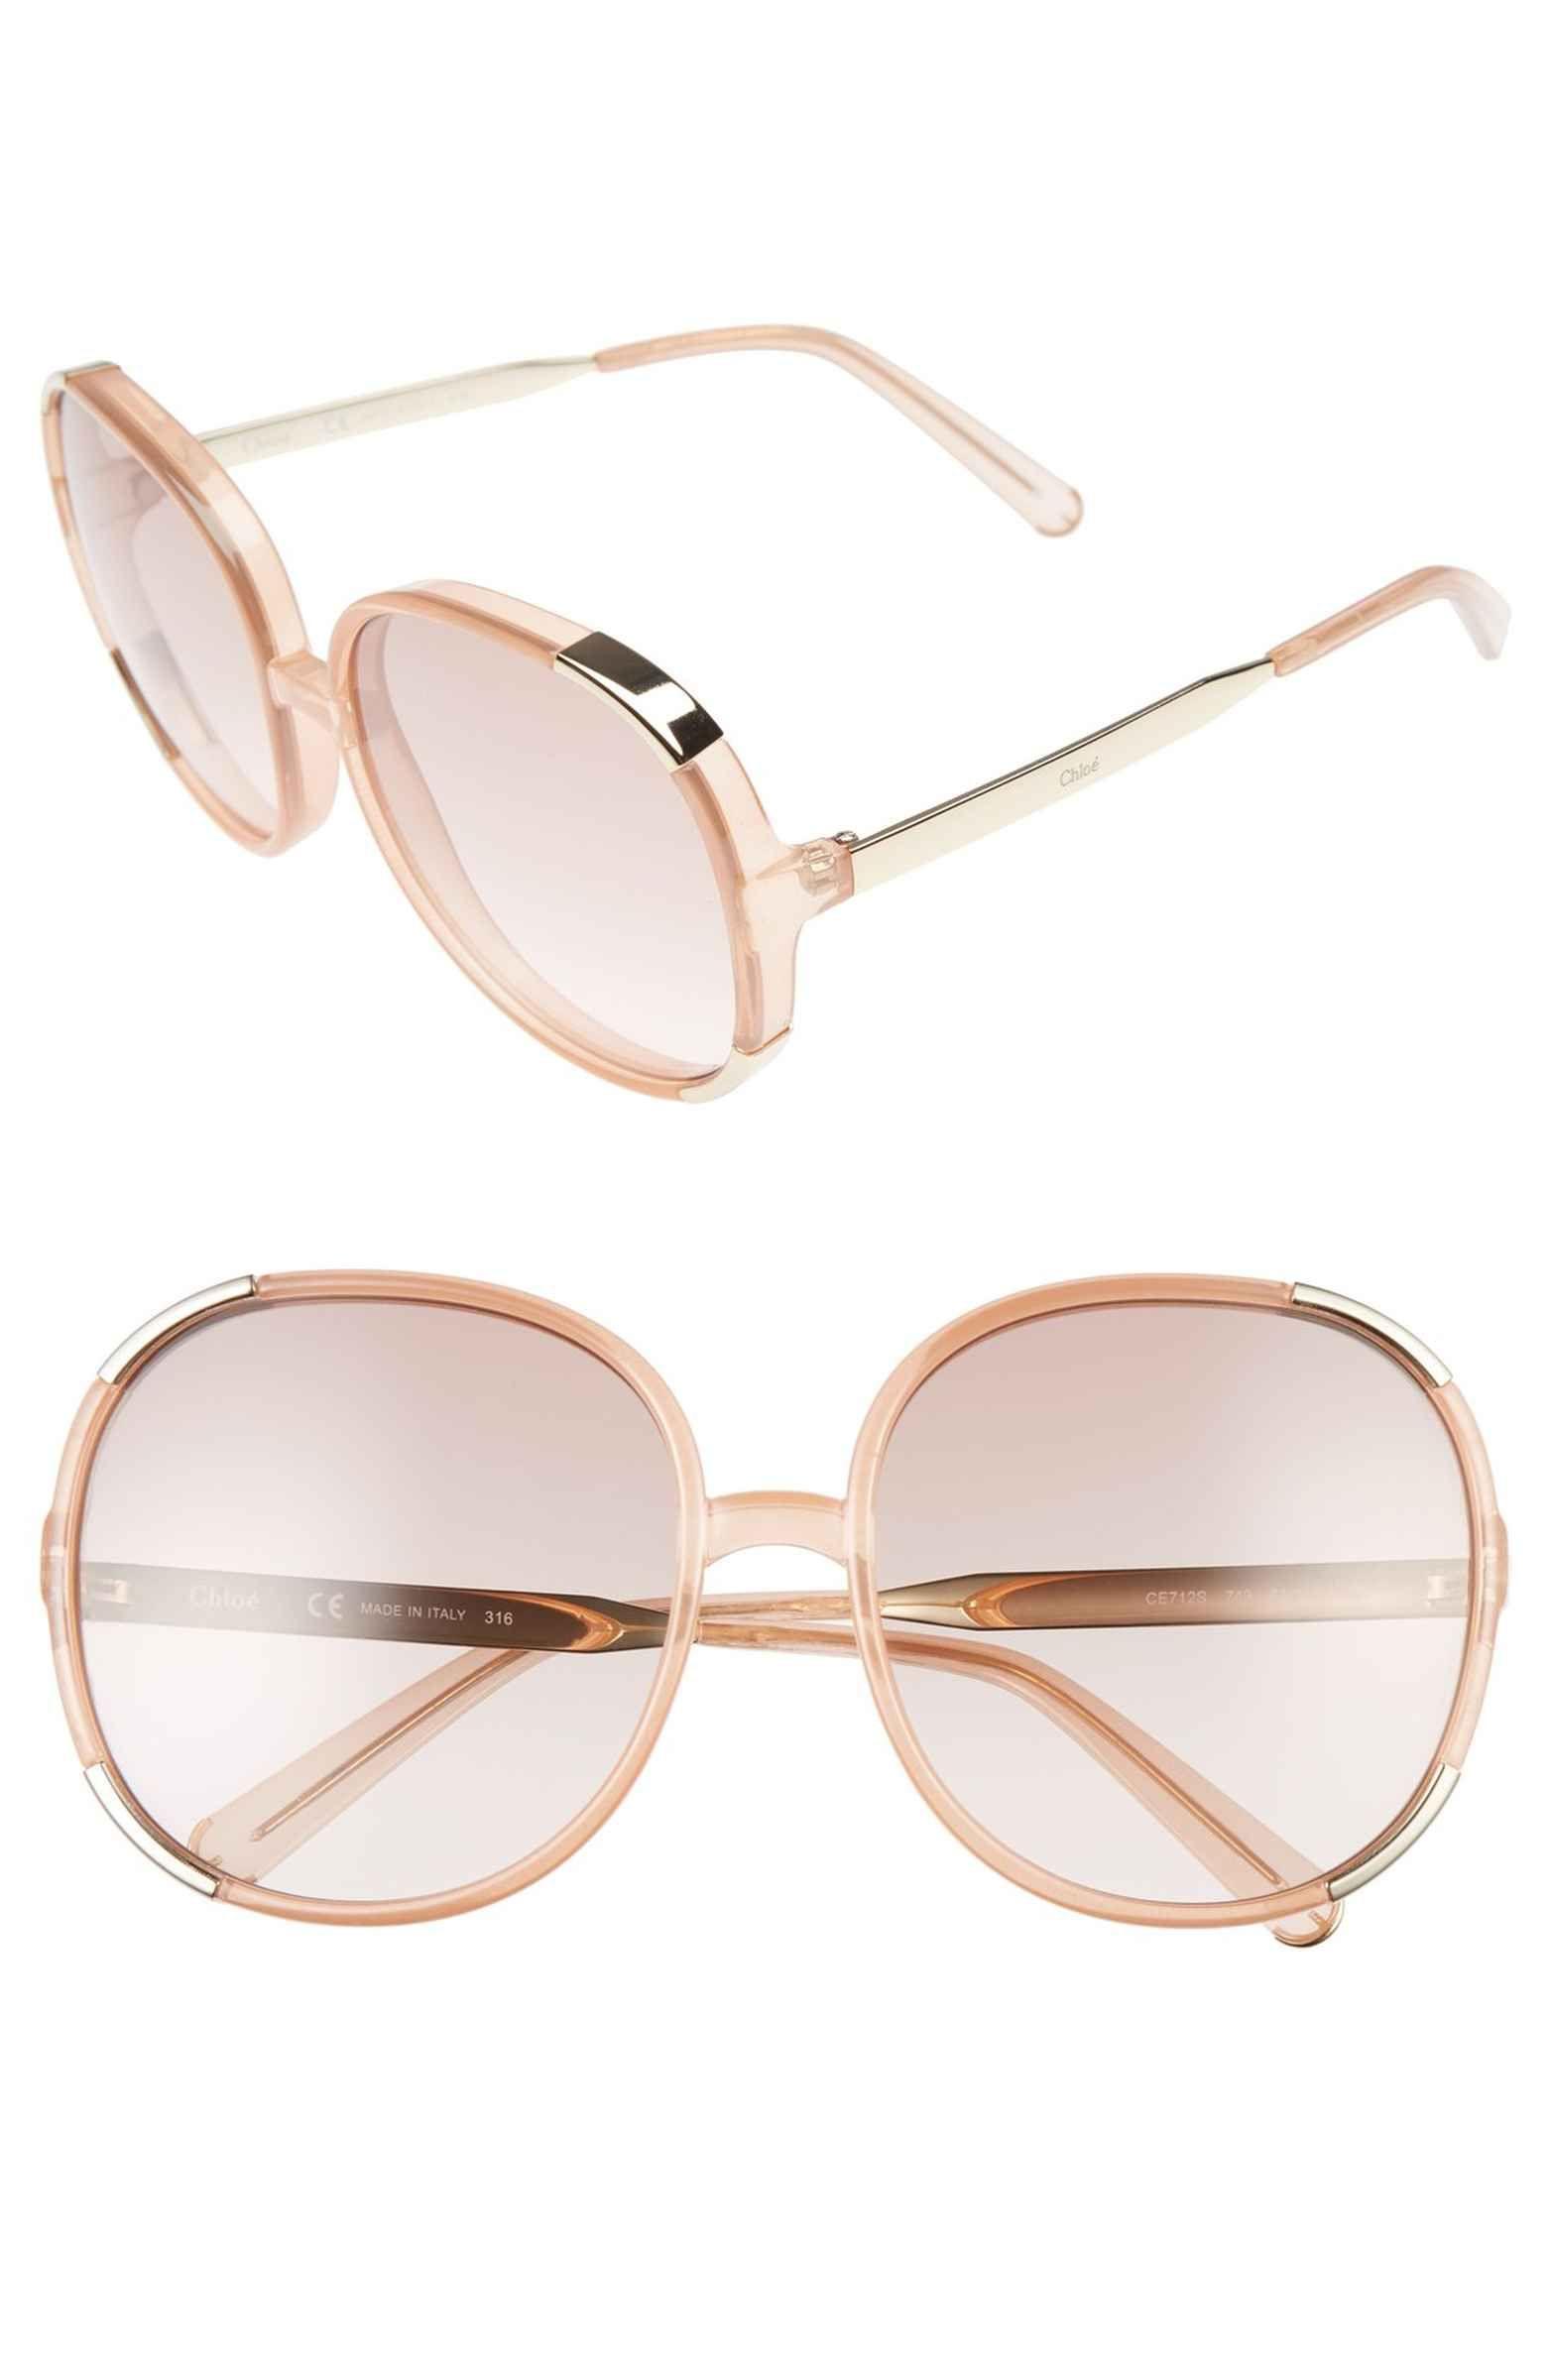 515546298cc3 Chloé Myrte 61mm Sunglasses